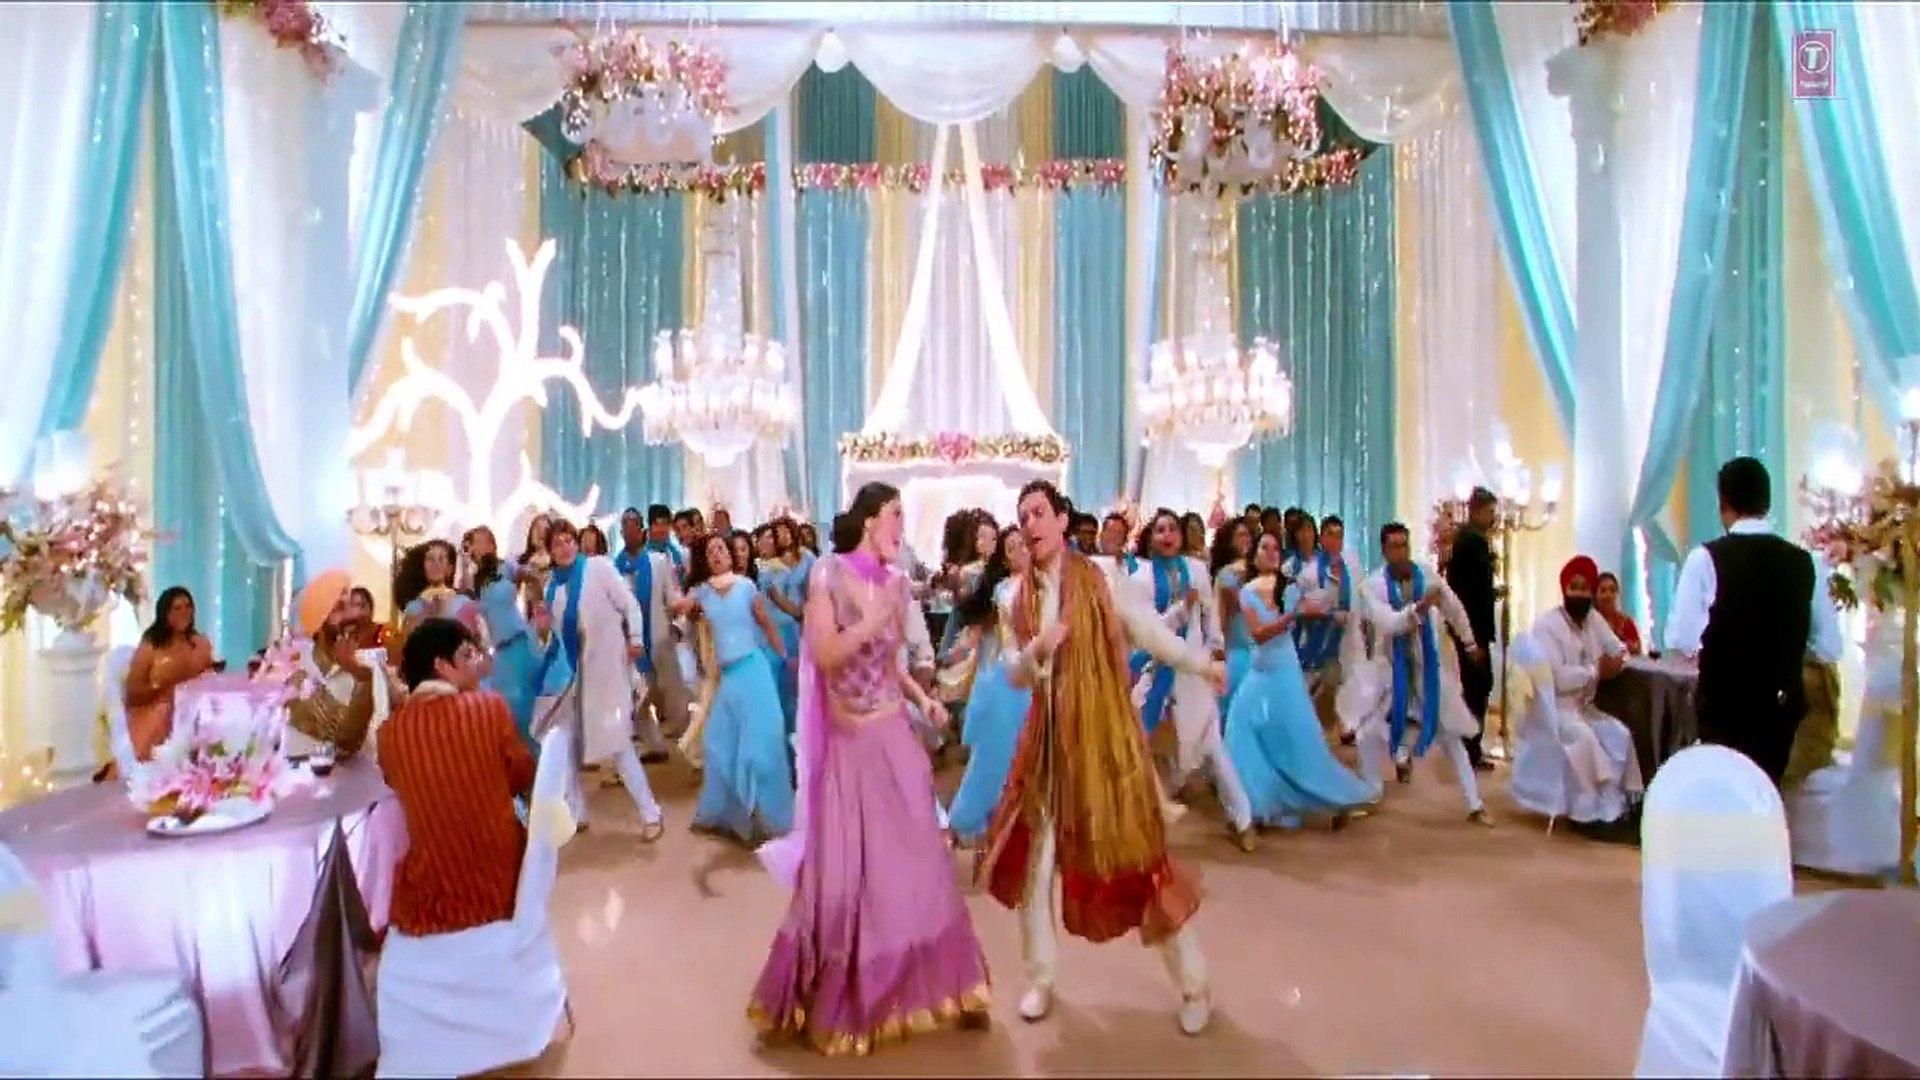 Zoobi Doobi 3 Idiots Full Song Feat. Aamir Khan, Kareena Kapoor